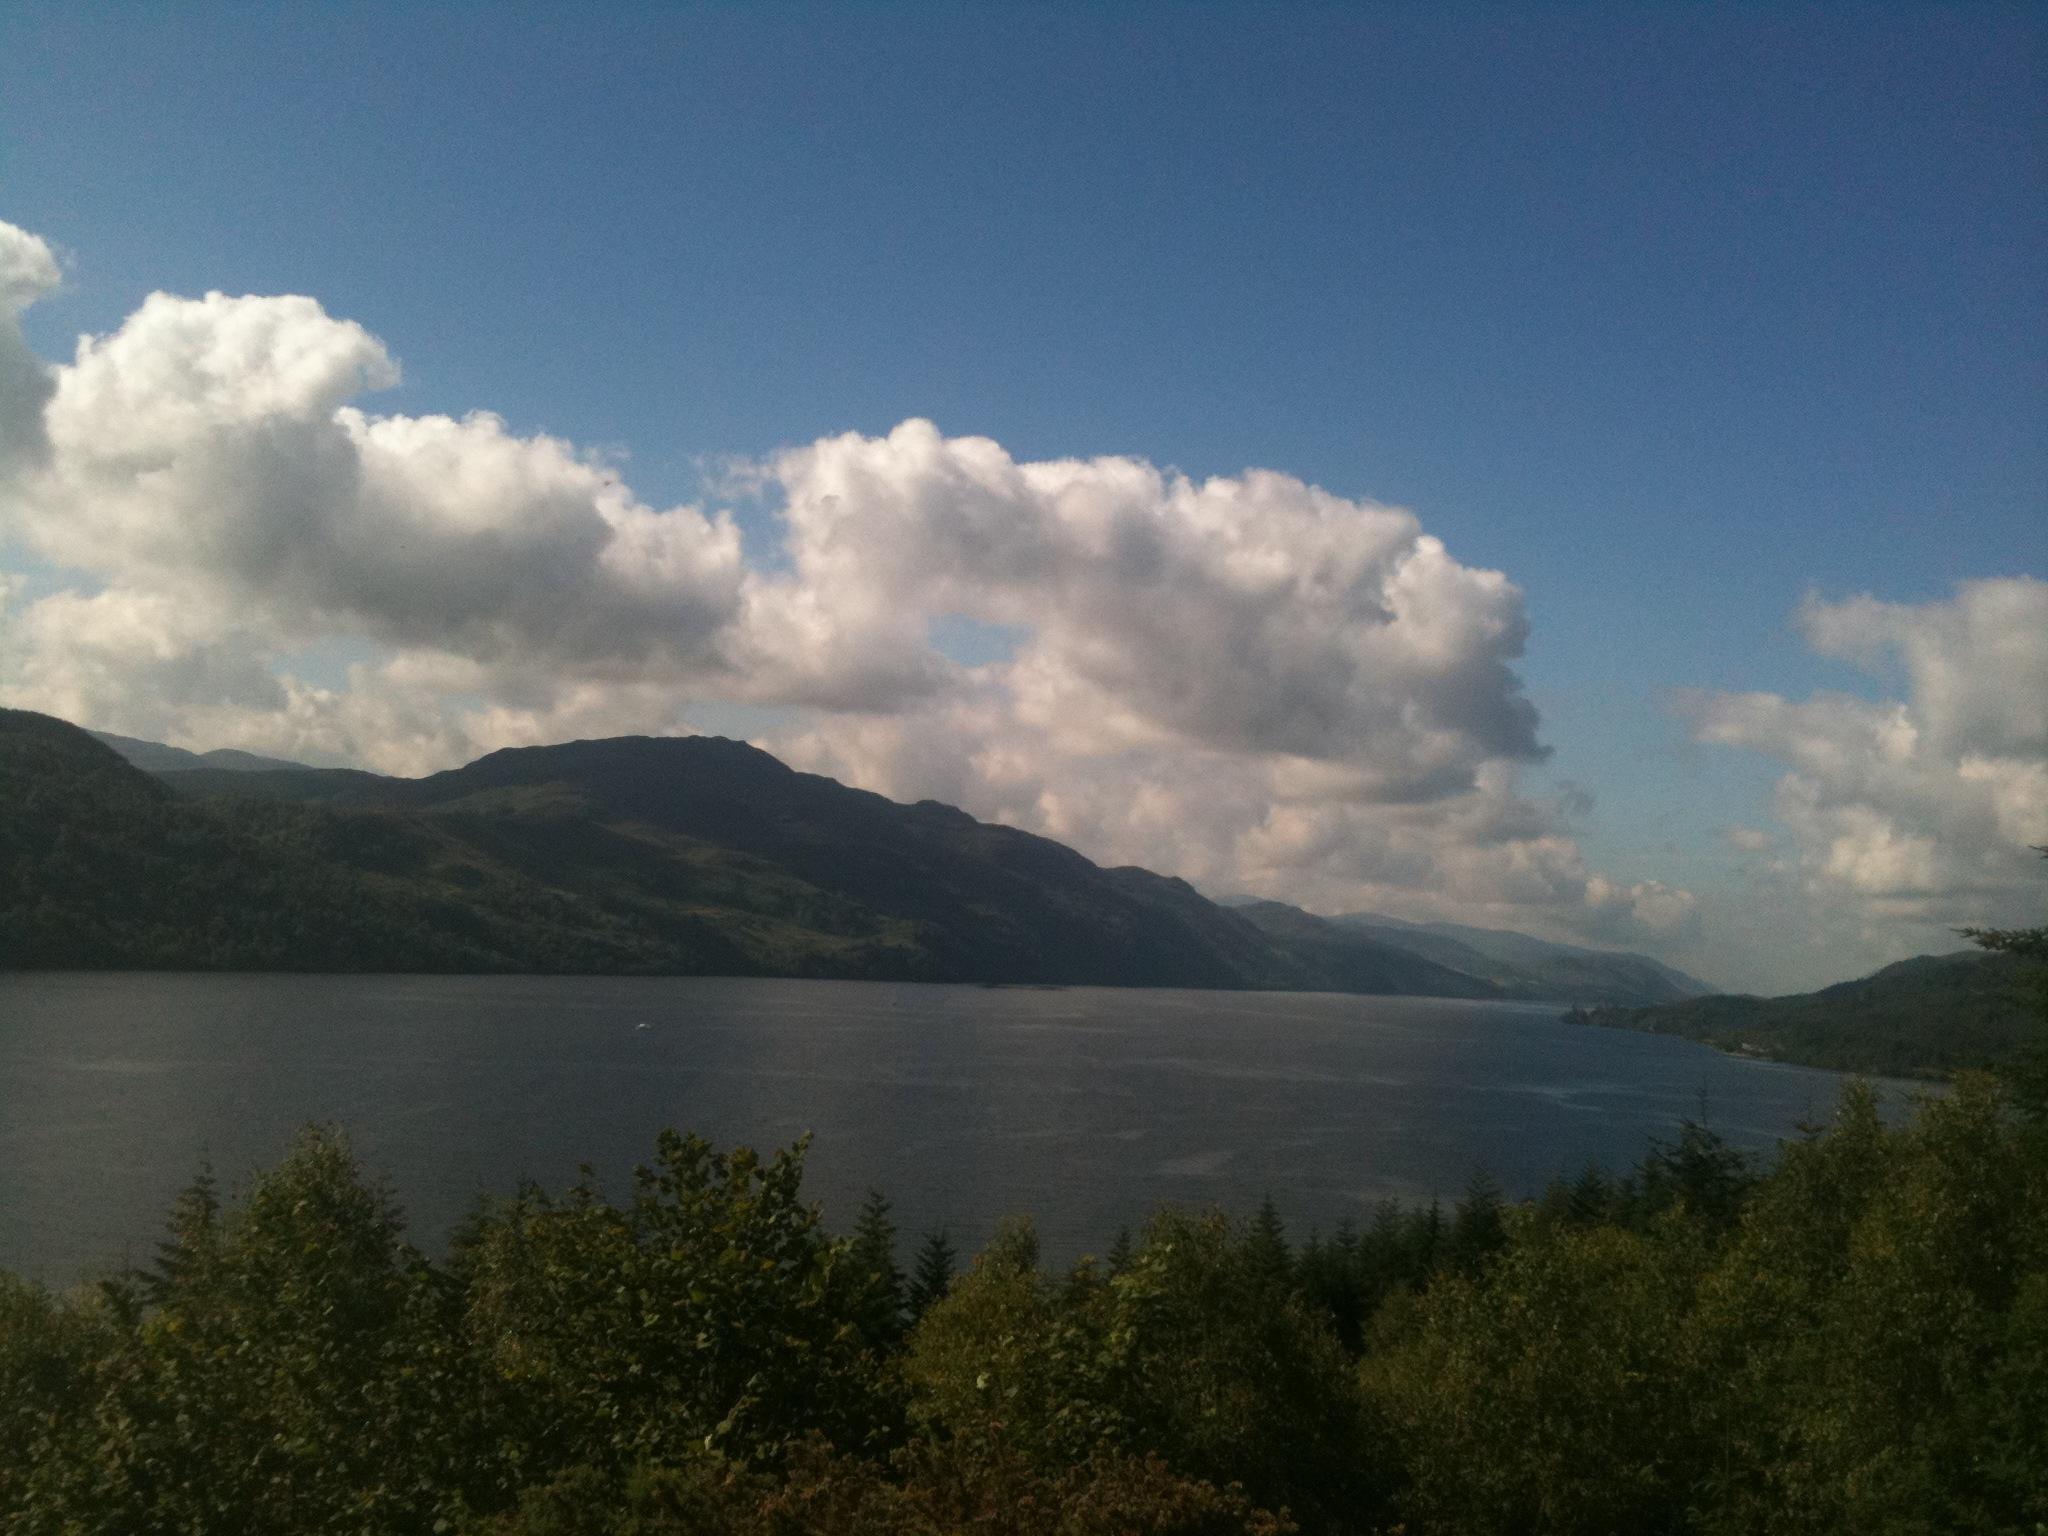 Loch Ness again